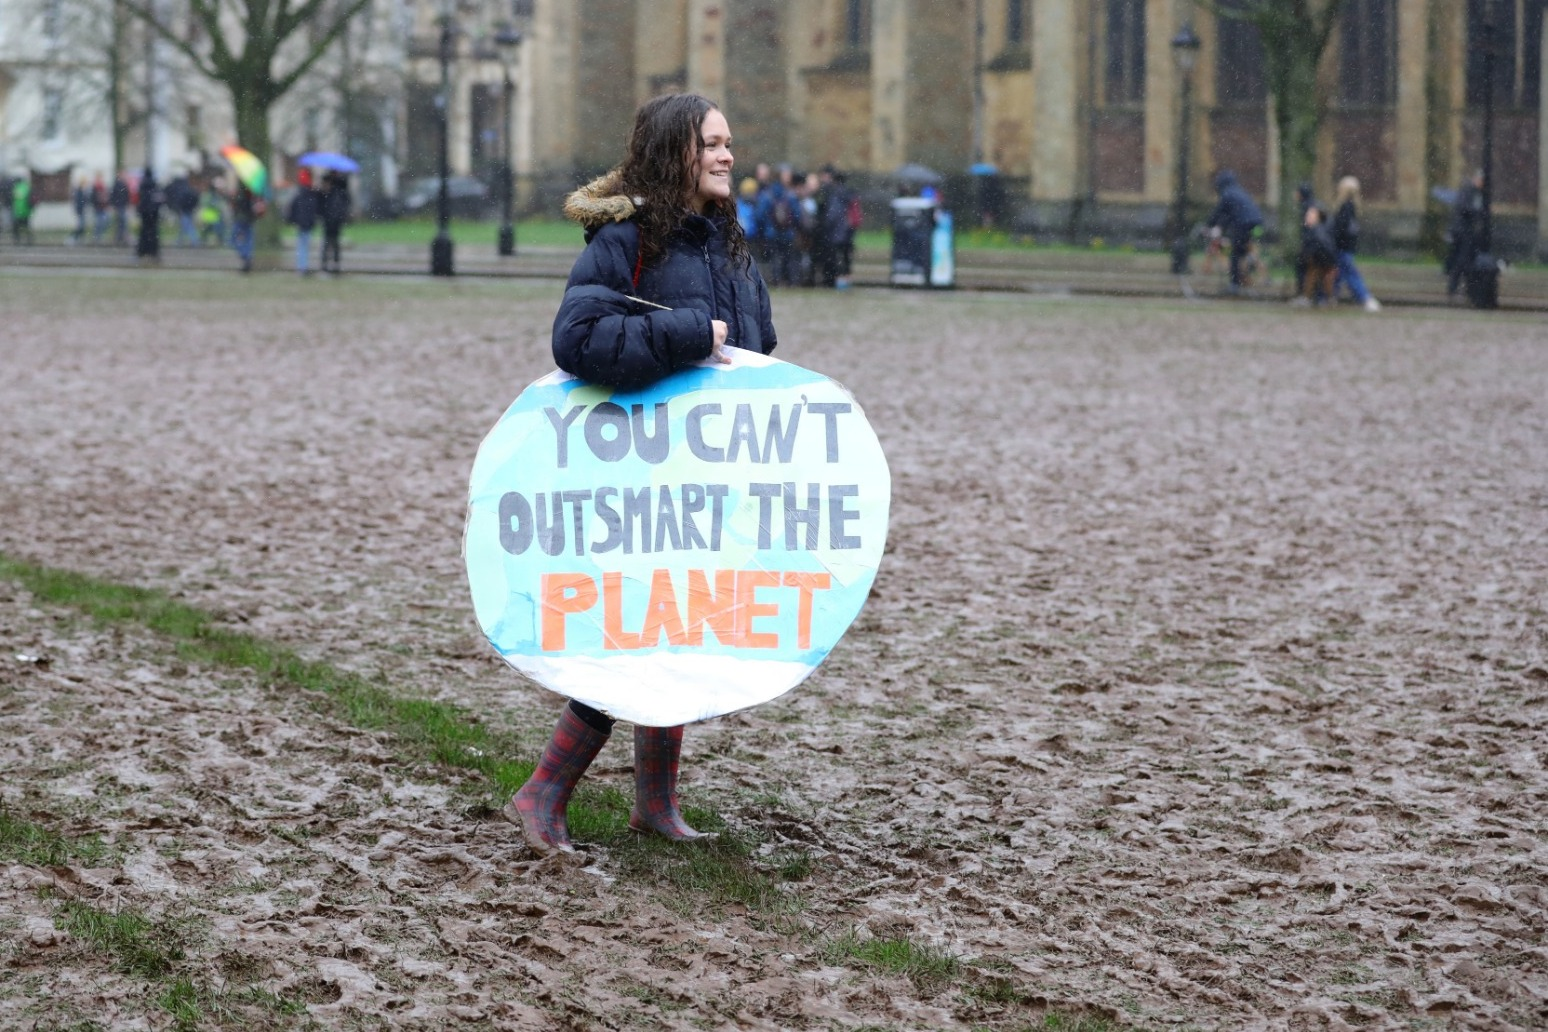 Teenage climate activist Greta Thunberg addresses protests in Bristol